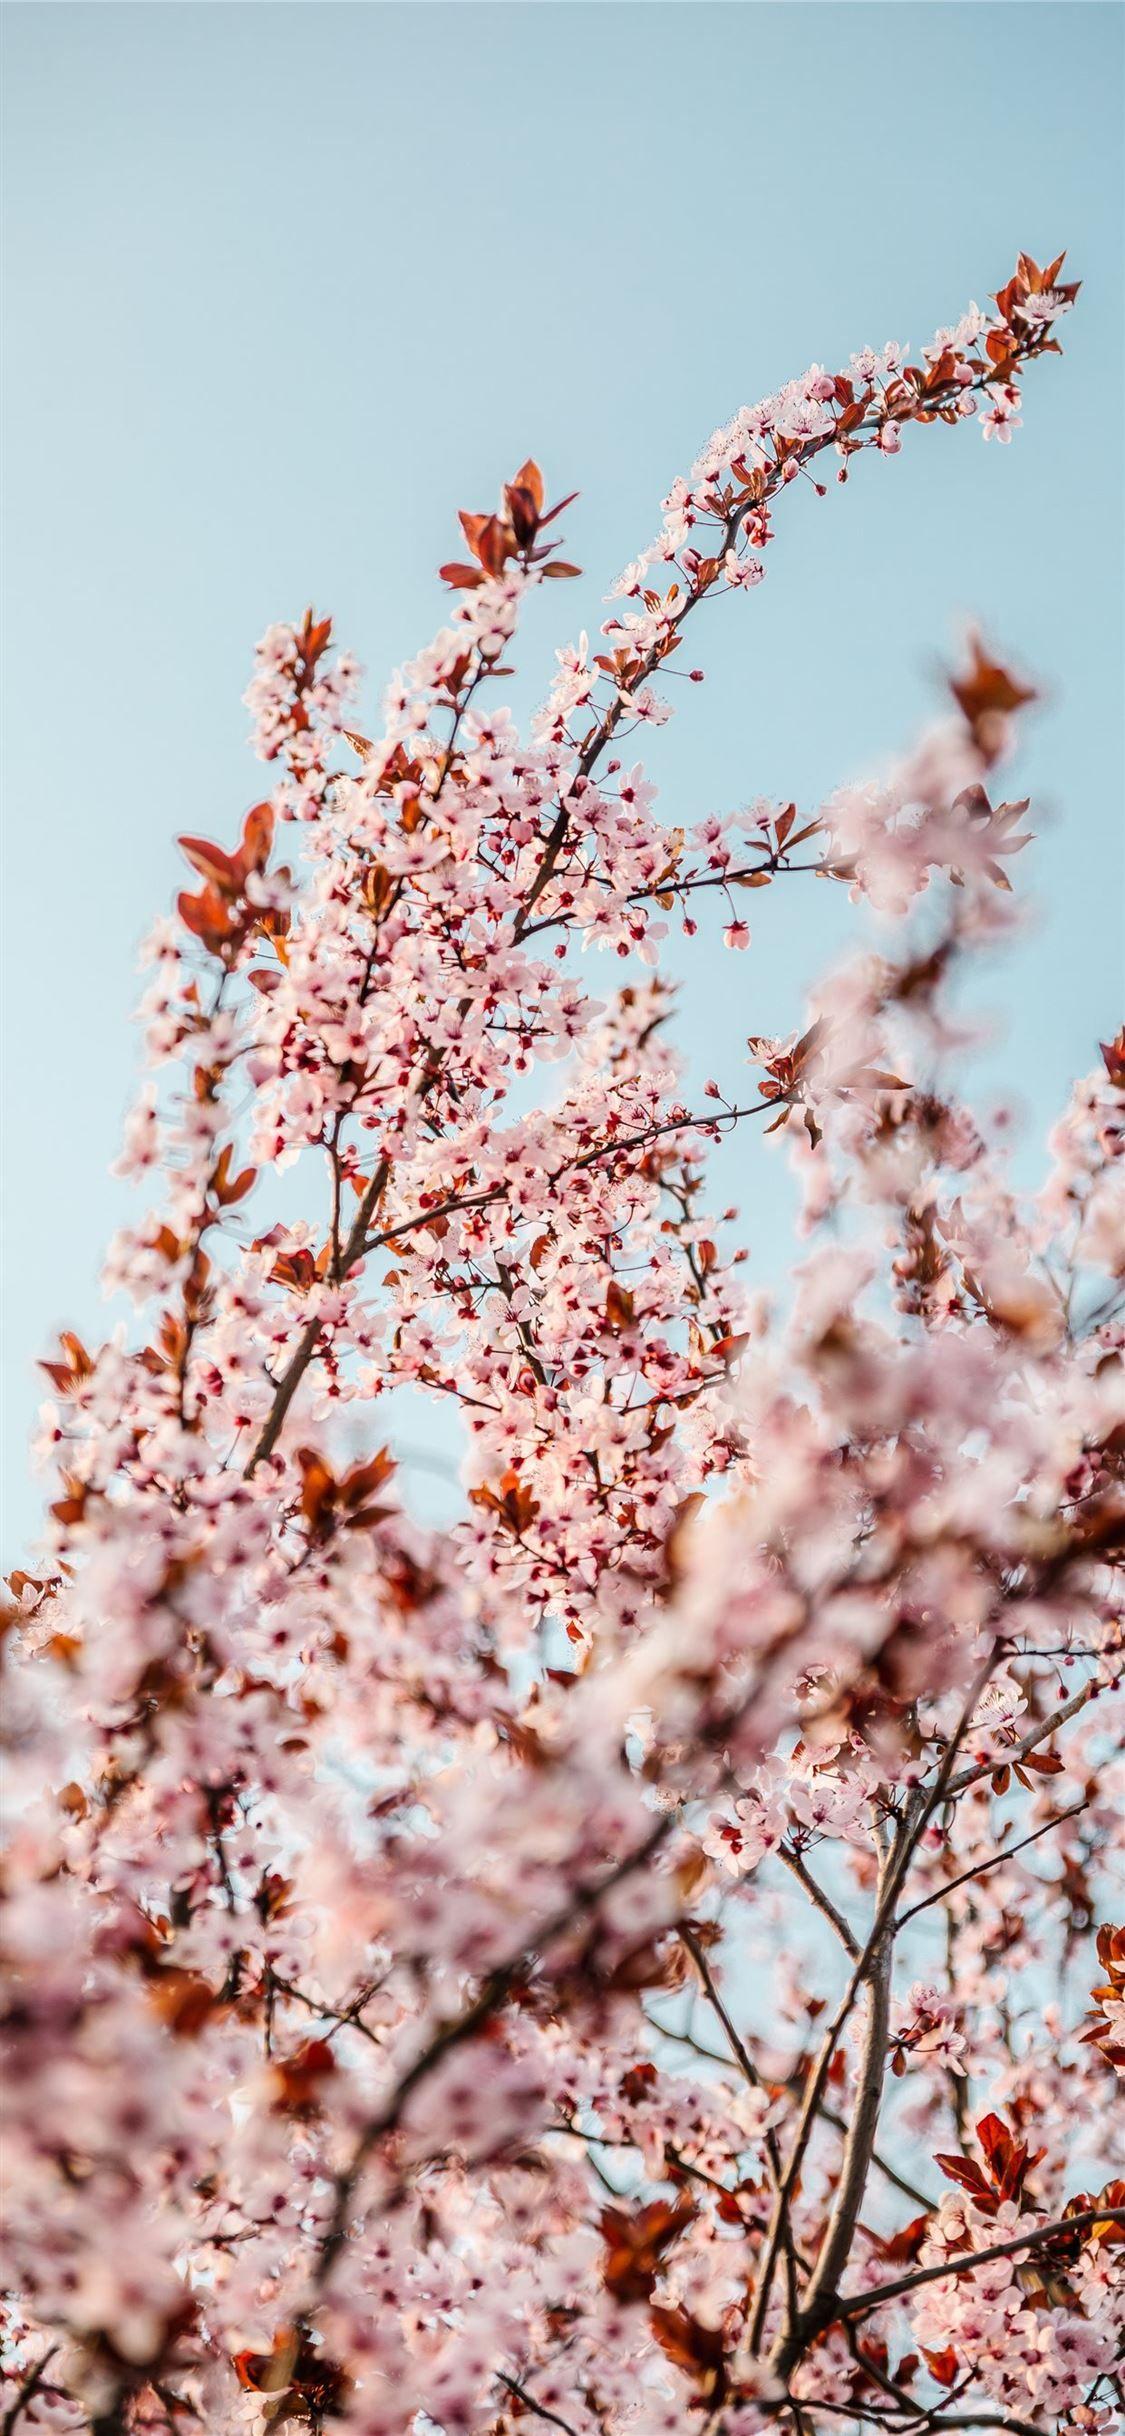 White Cherry Blossom Tree During Daytime Flower Cherryblossom Tree Spring Grey Iphonexwallpaper White Cherry Blossom Cherry Blossom Tree Blossom Trees